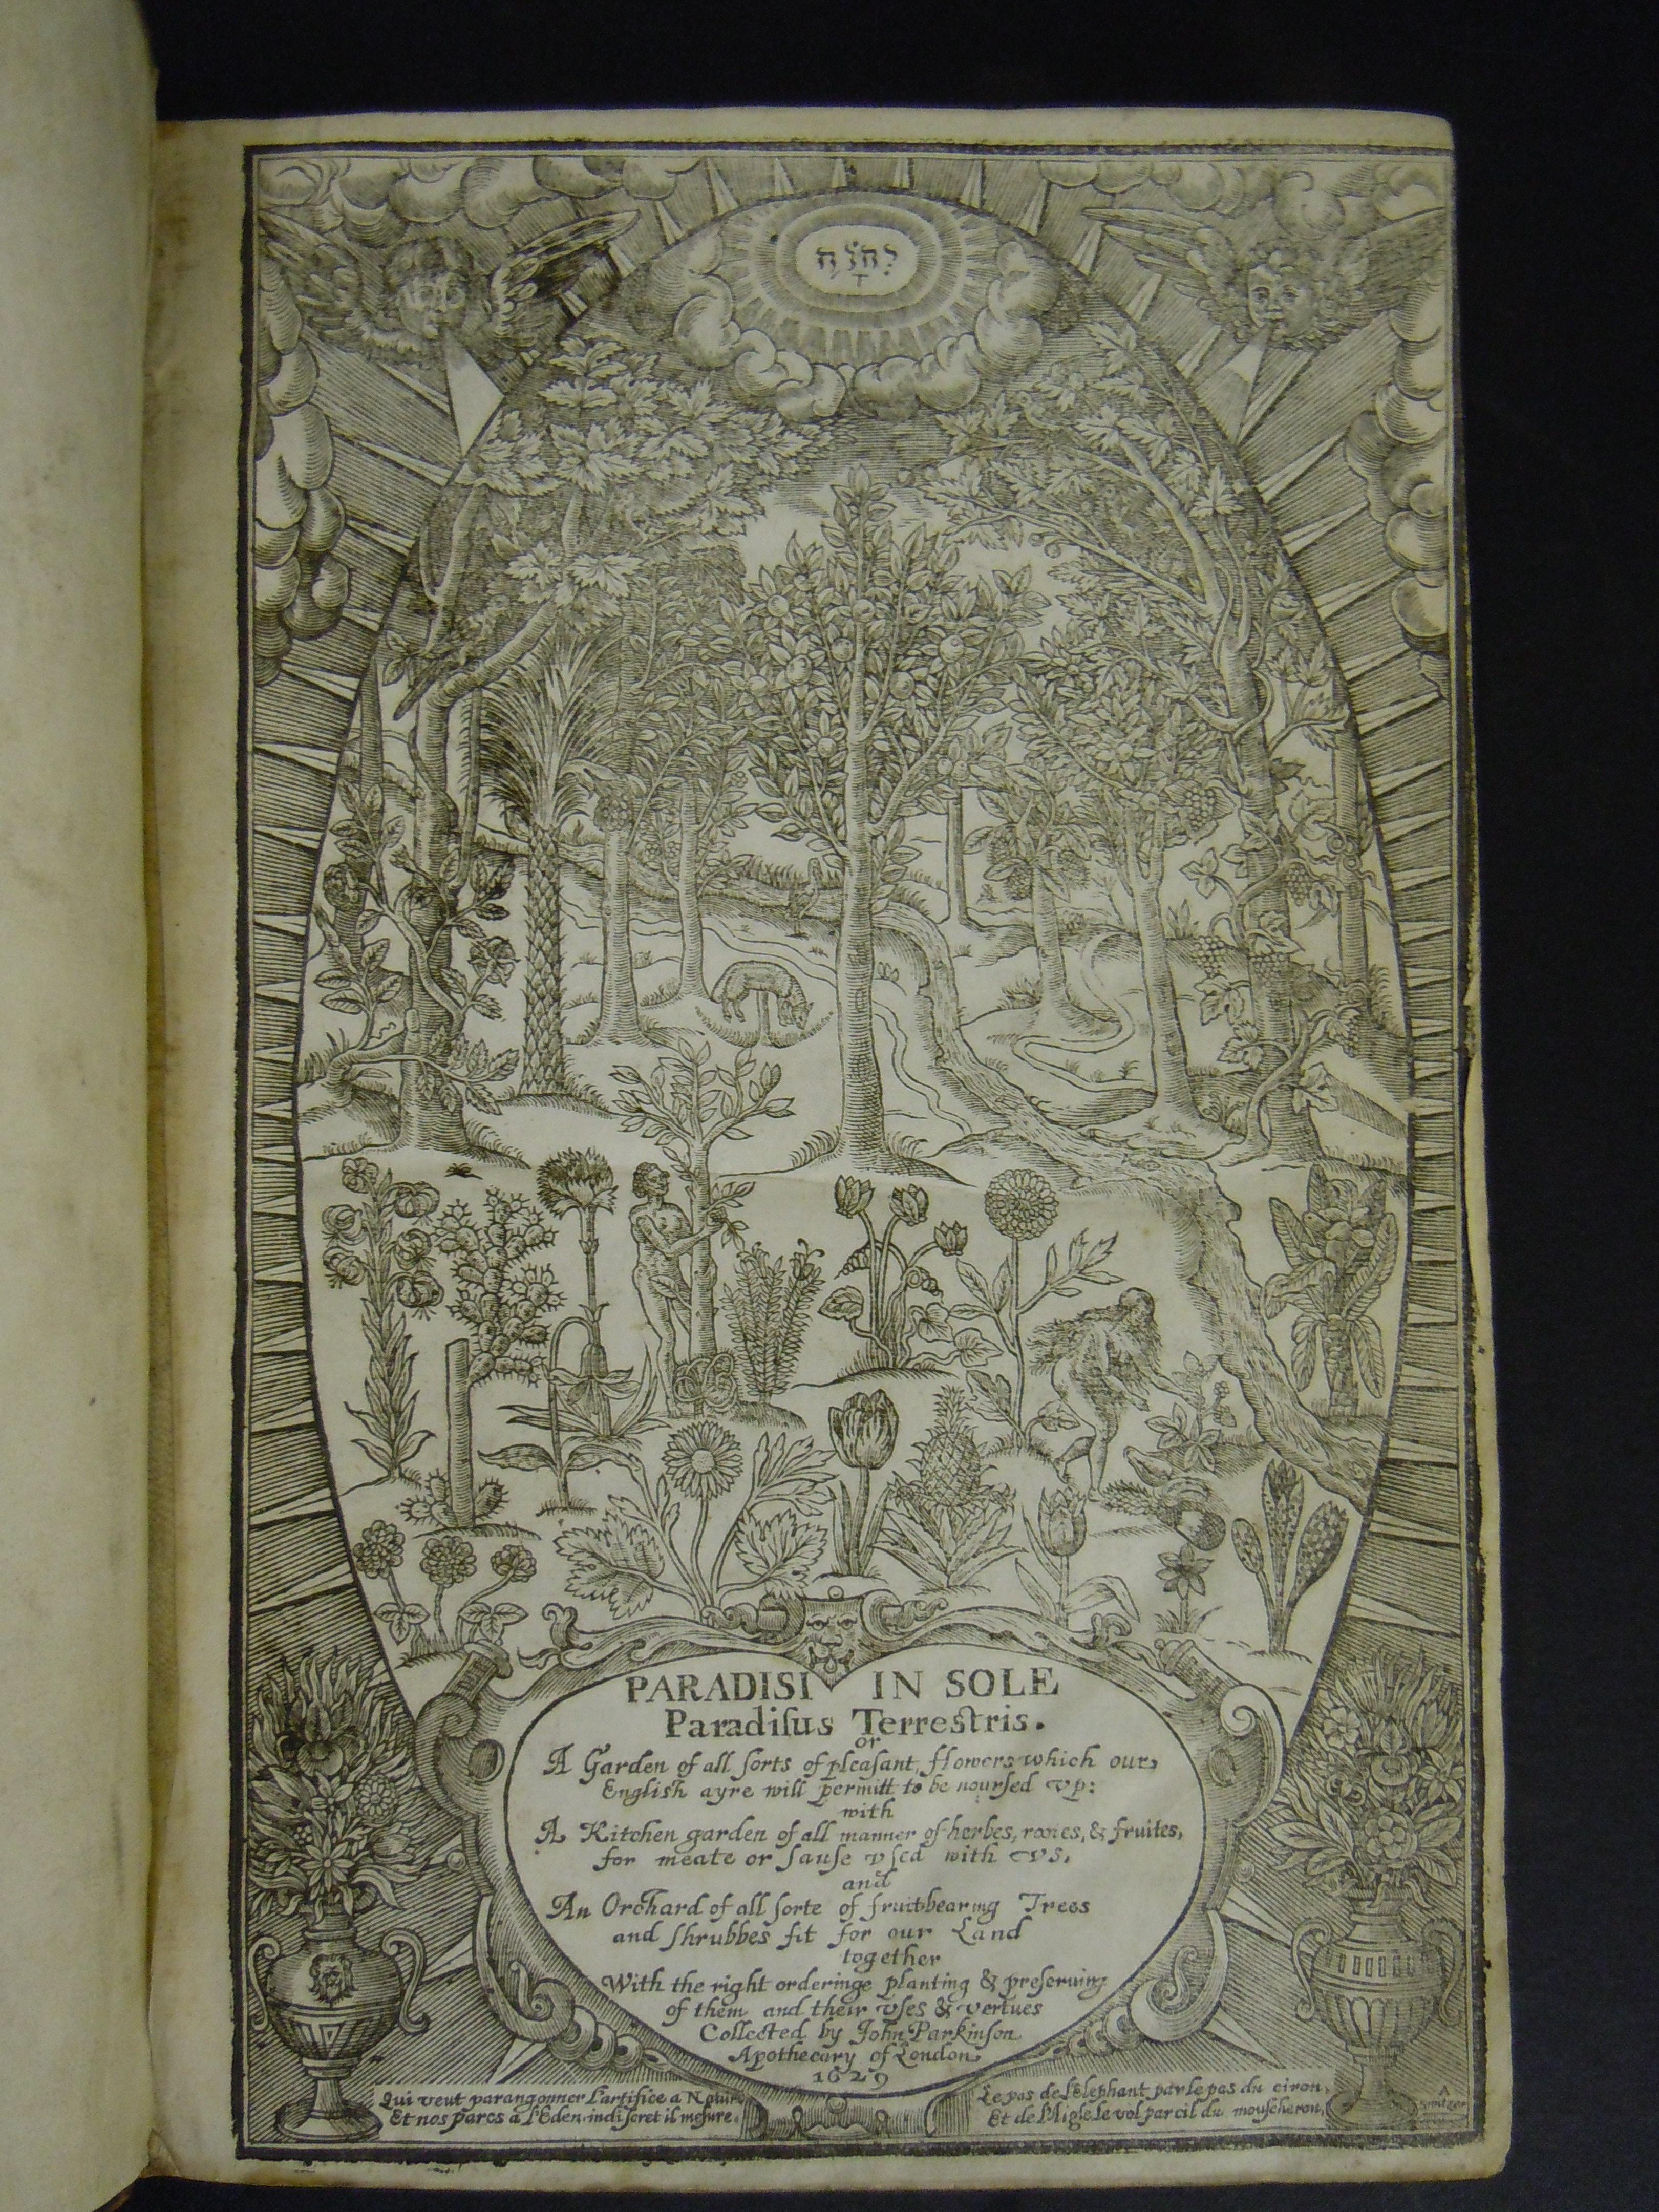 BT1.31.13, title page, John Parkinson's Paradisi in sole paradisus terrestris, 1629